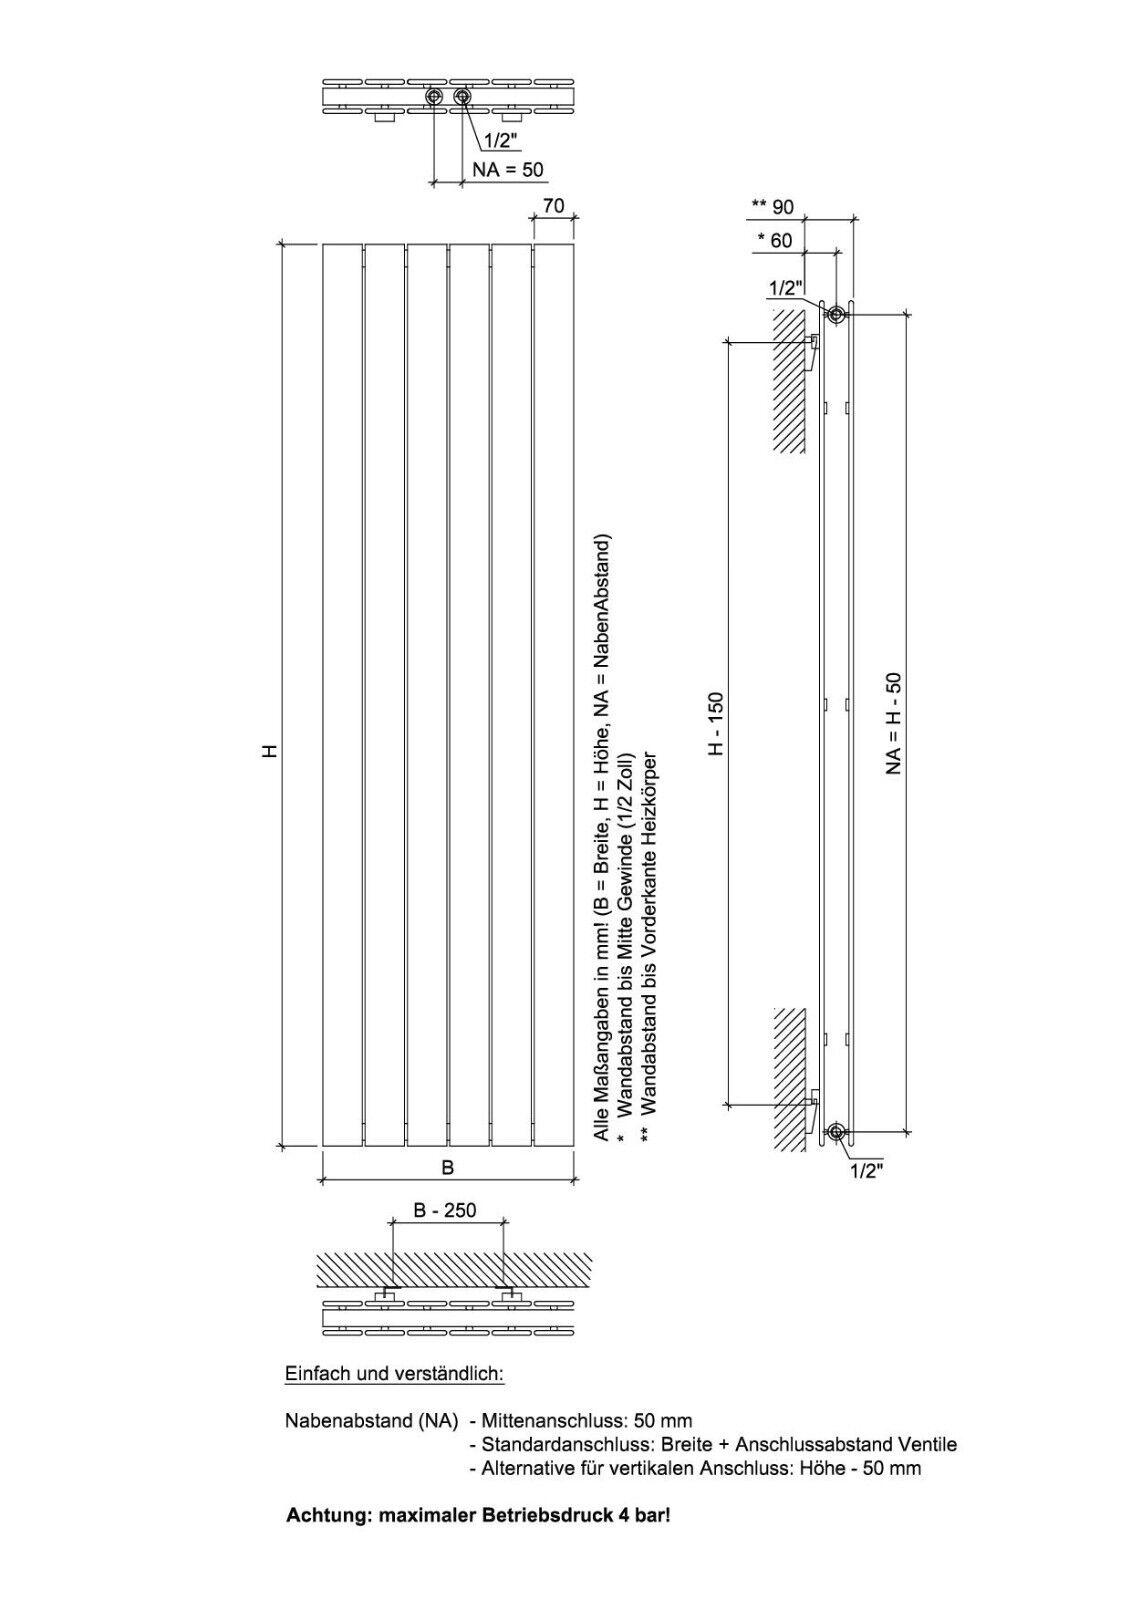 Ximax Design-Heizkörper Raum-Heizkörper P1 Duplex 1218W Mittenanschluss Mittenanschluss Mittenanschluss 0a3271